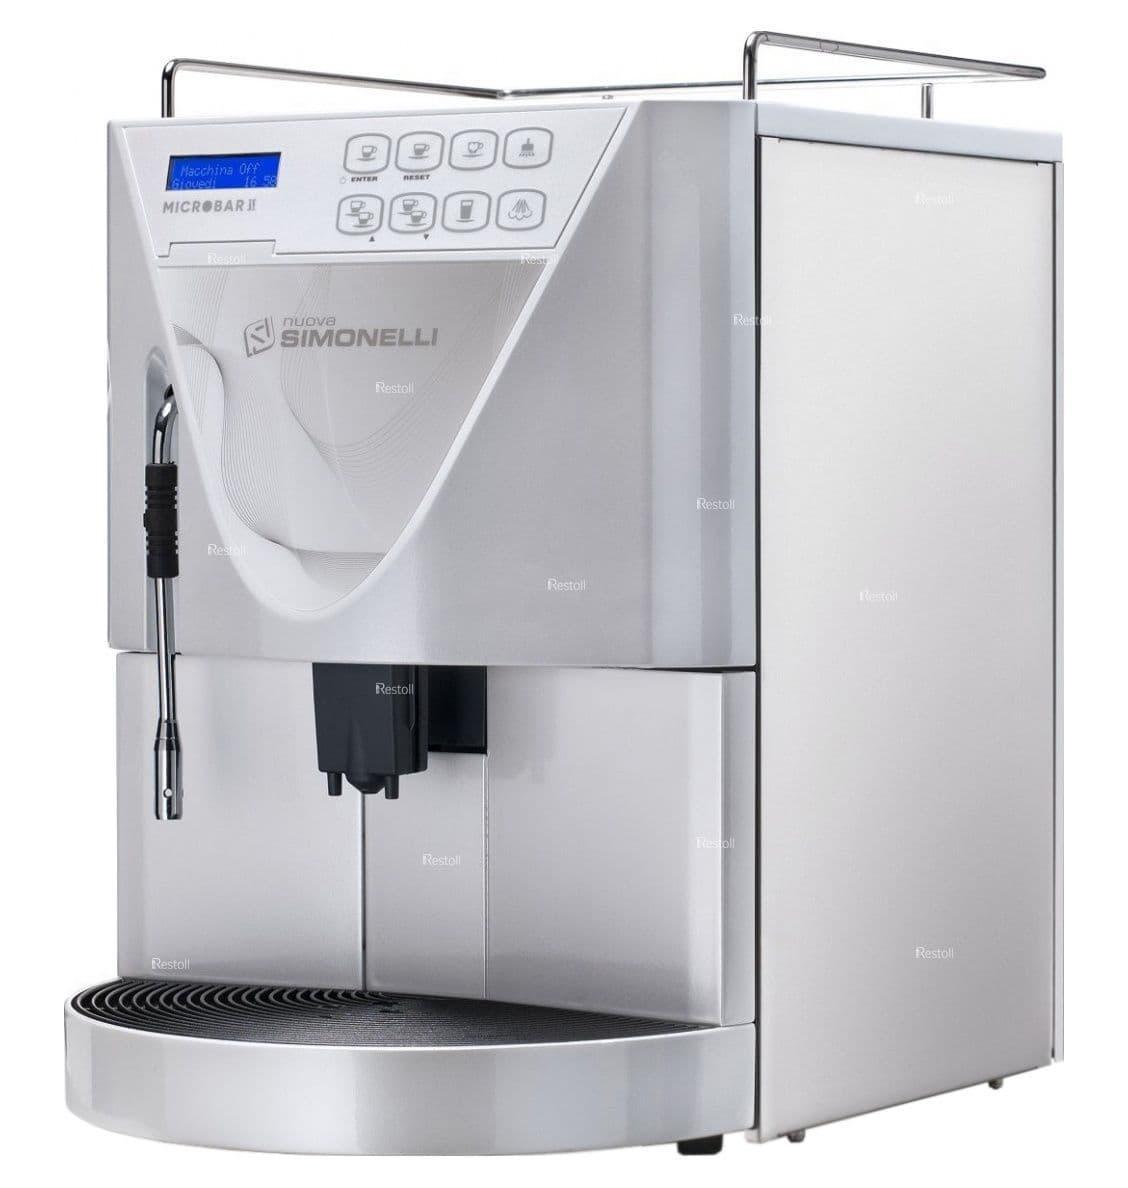 Кофемашина Nuova Simonelli Microbar II